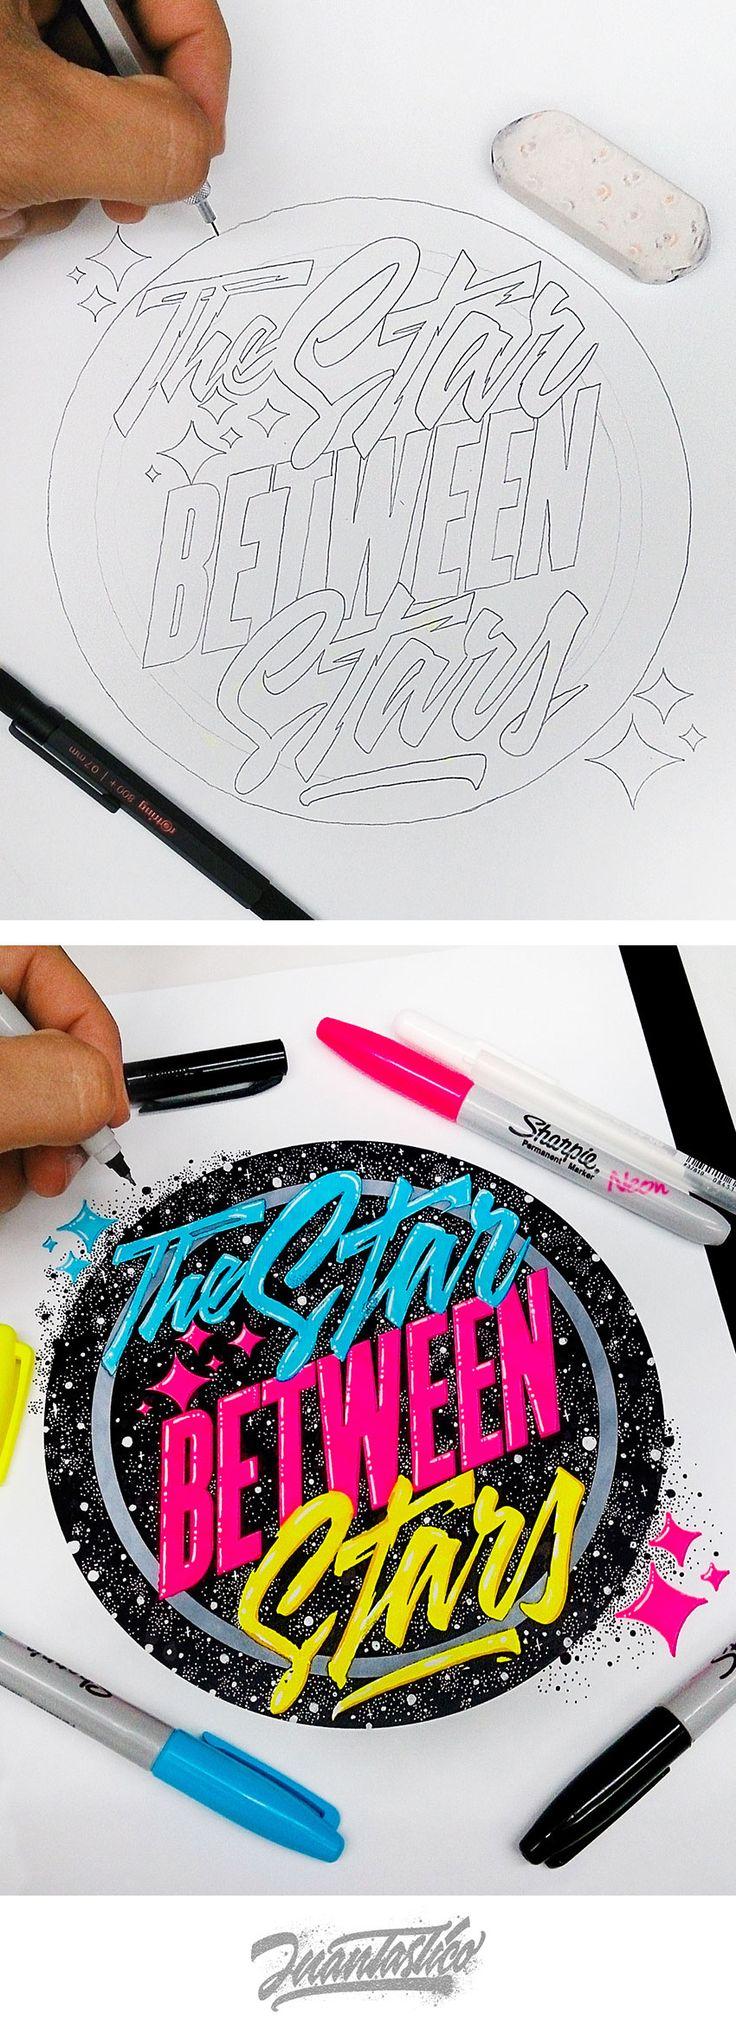 Typography Illustrations Vol.4 on Behance